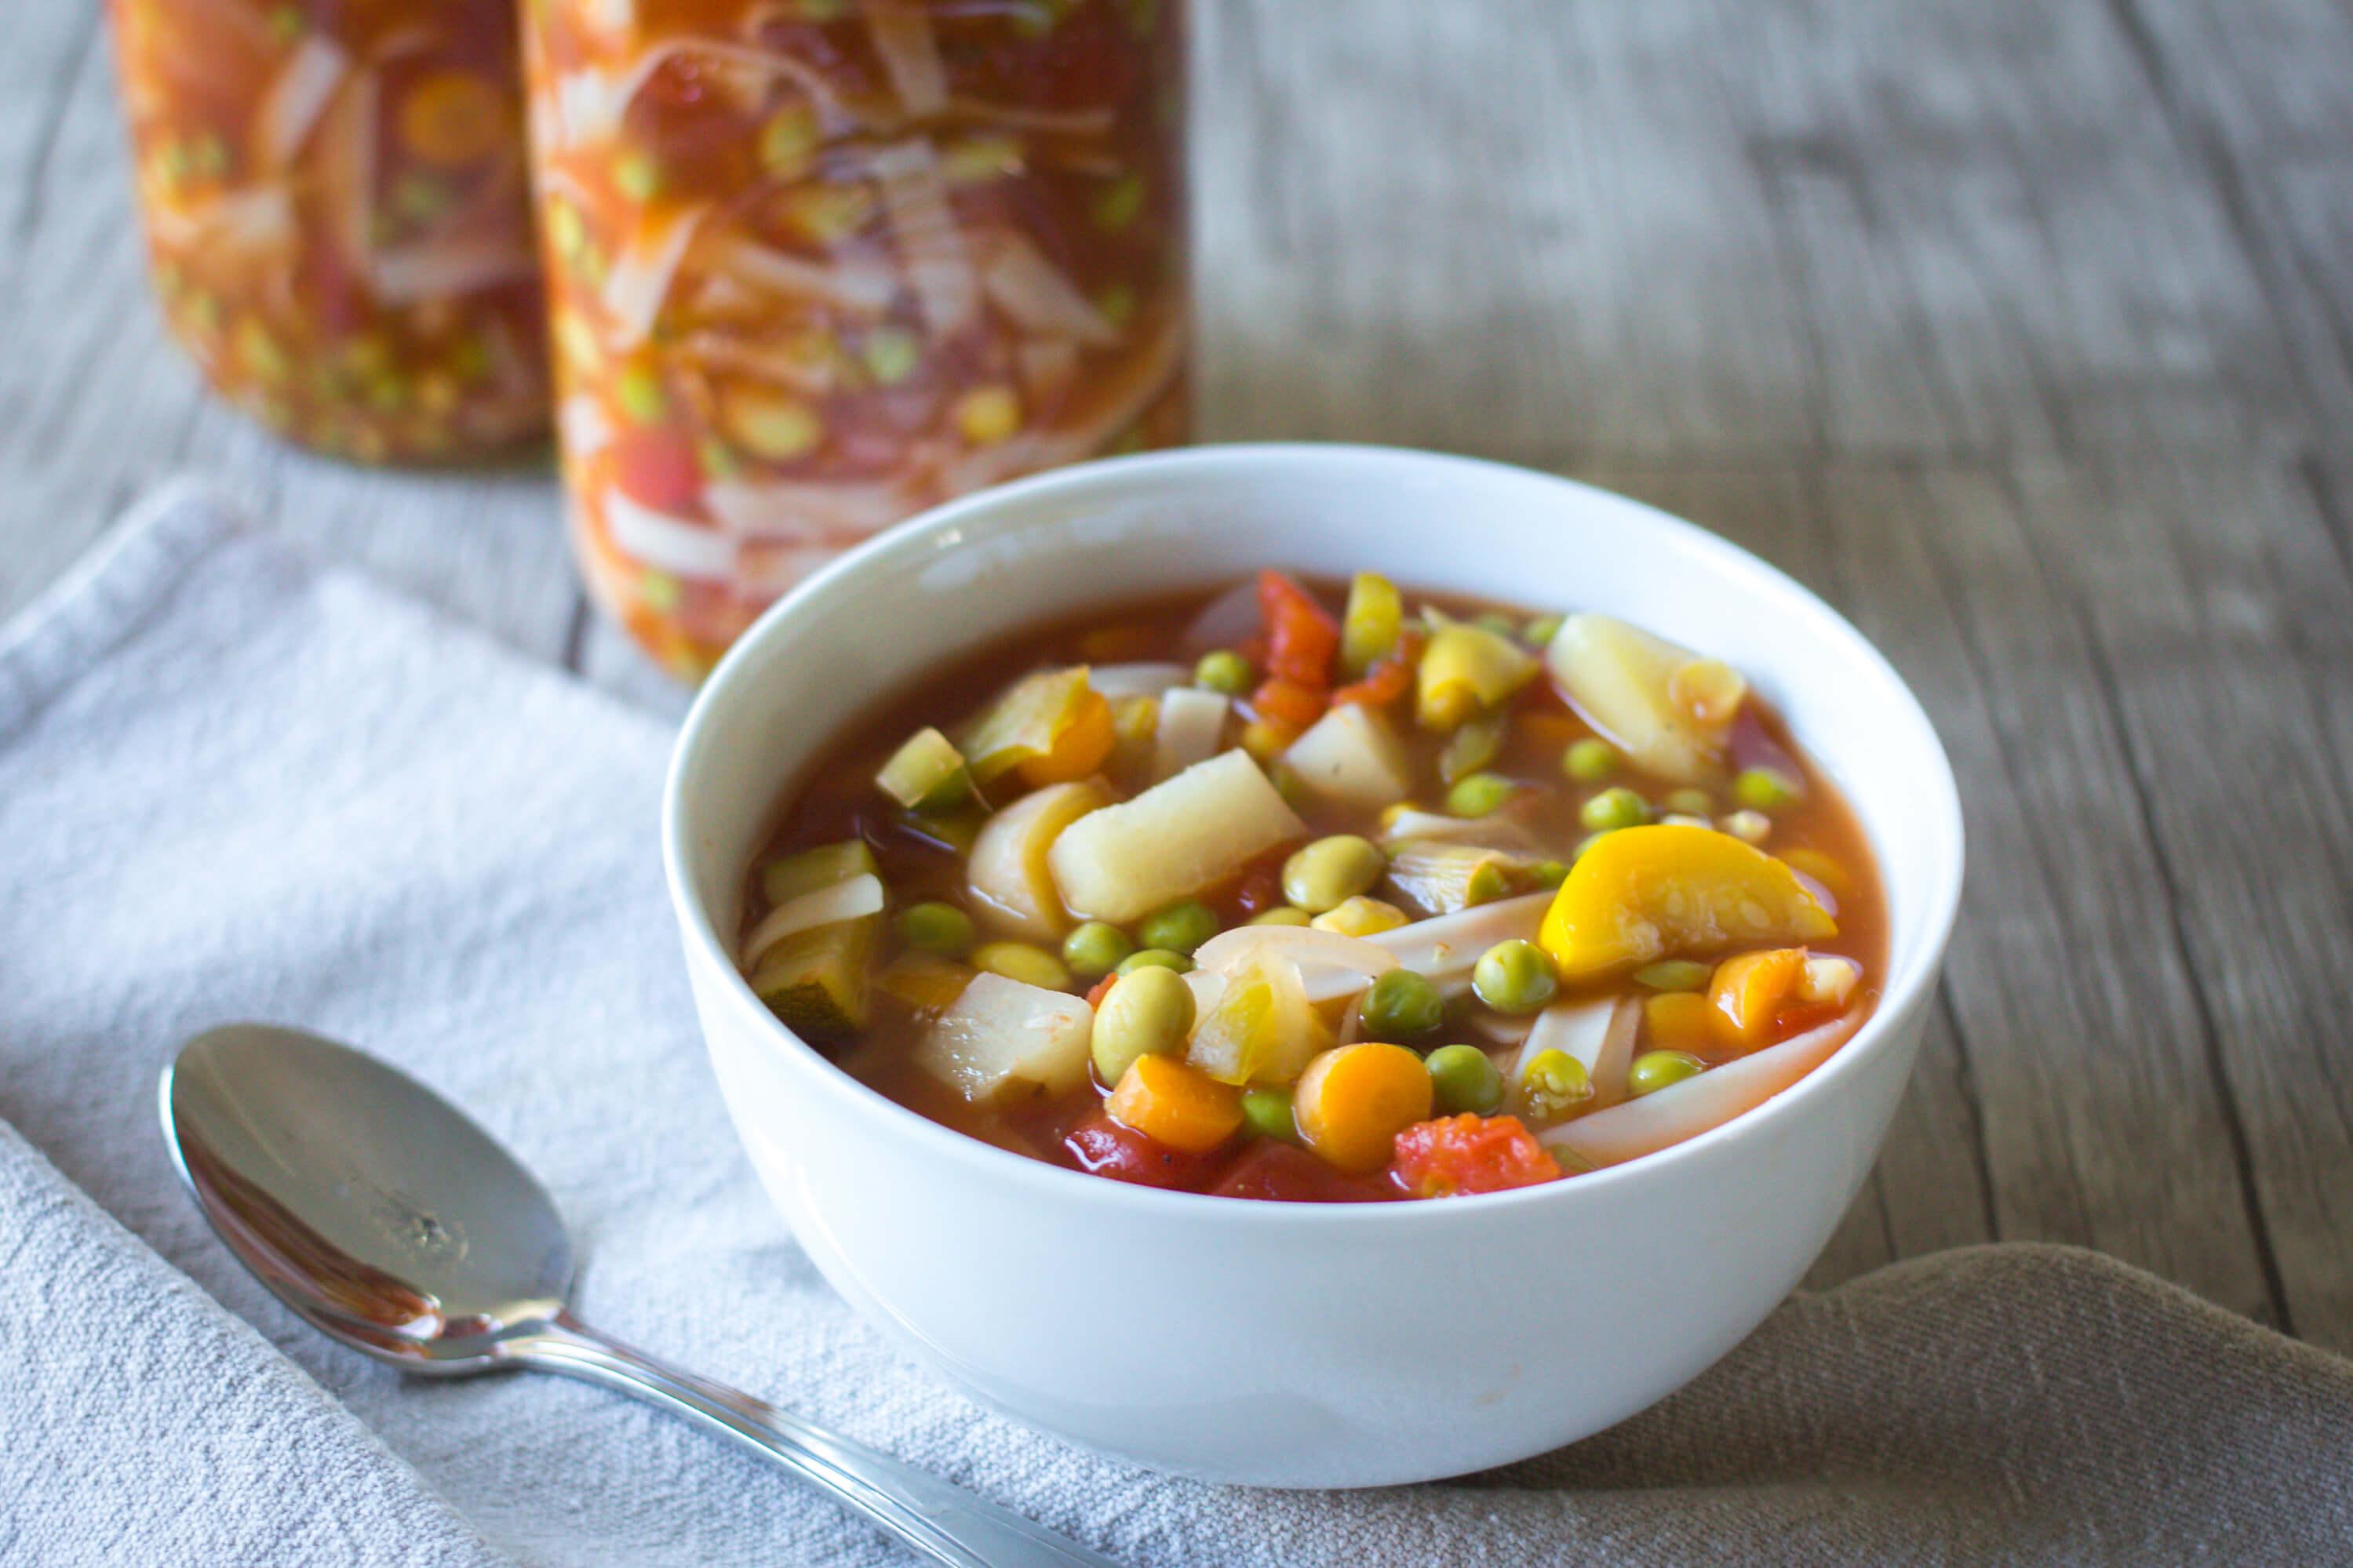 Full of Veggies Minestrone Soup